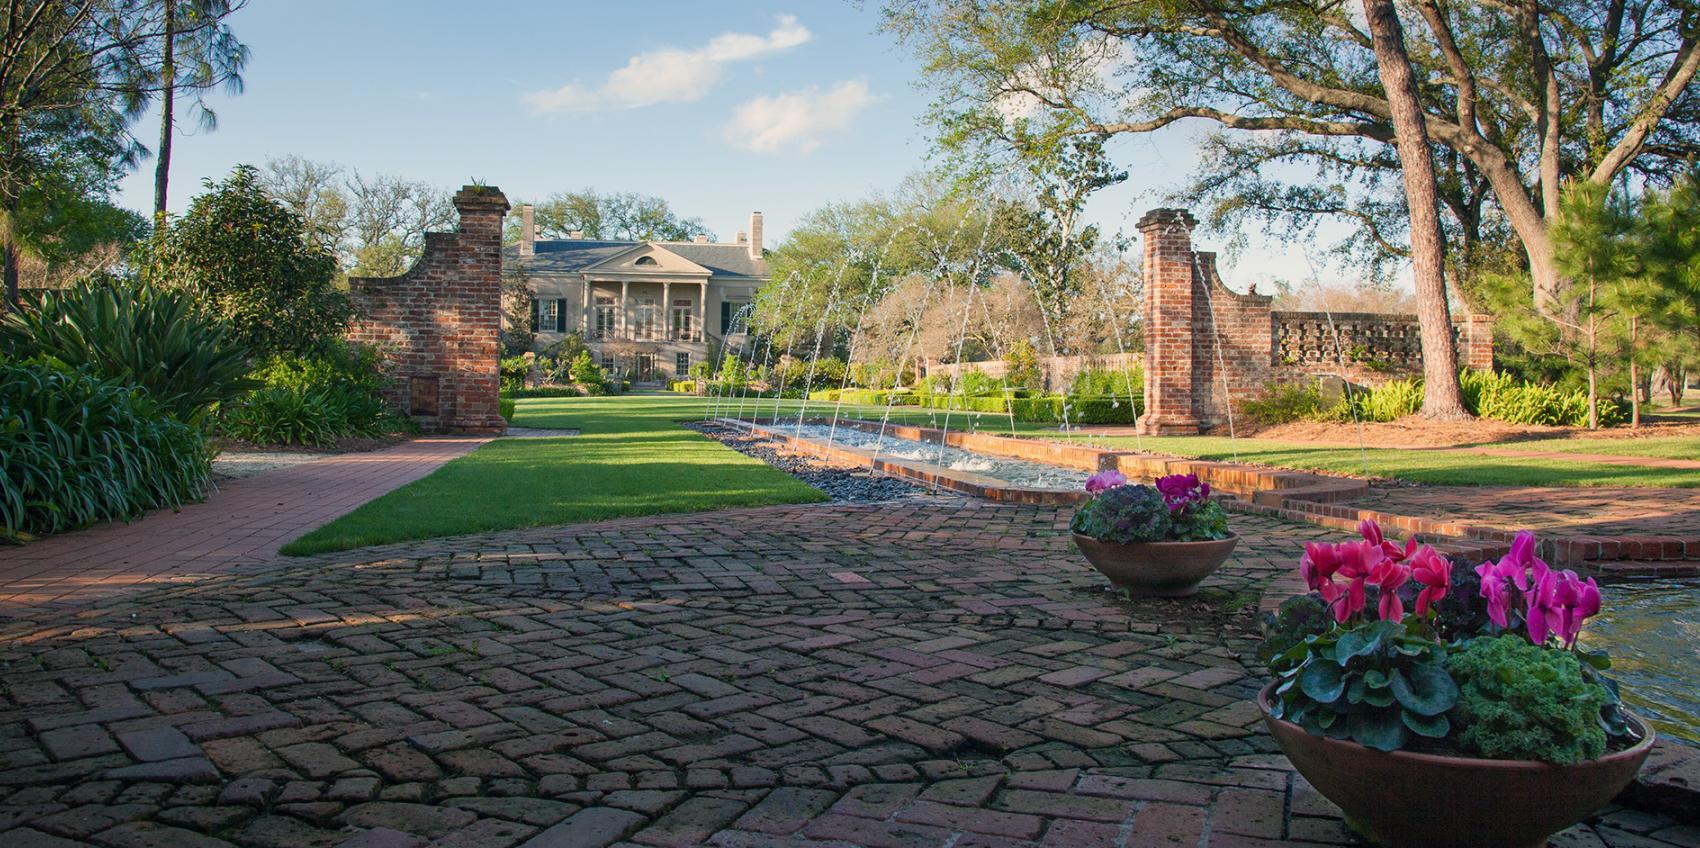 Longue Vue House And Gardens American Public Gardens Association